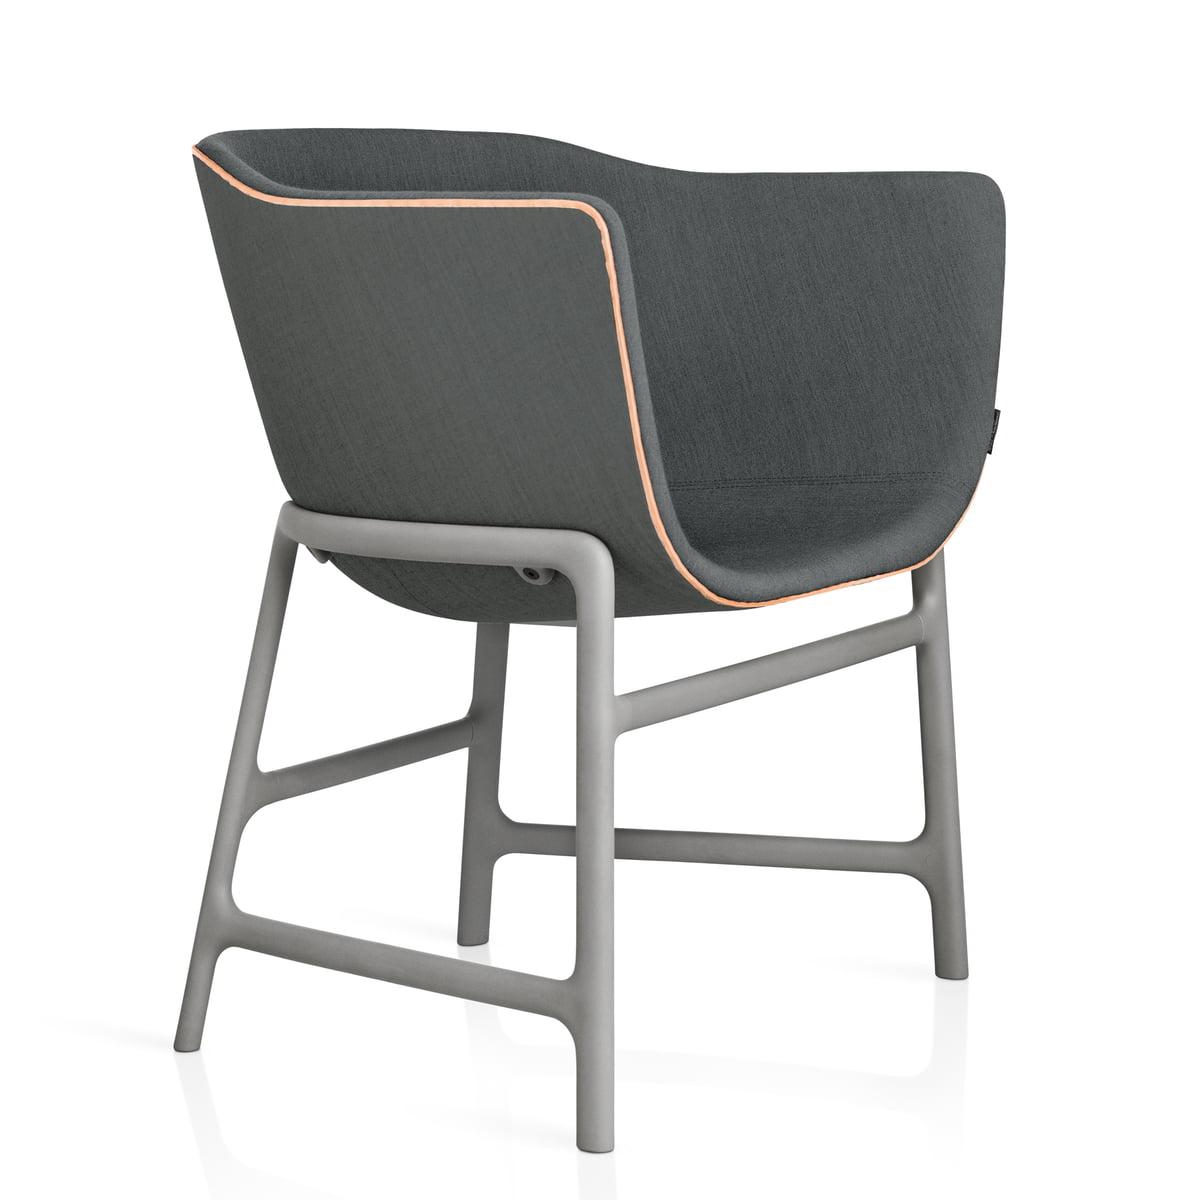 fritz hansen minuscule stuhl dunkelgrau remix 163 dunkelblau grau remix 173 dunkelgrau. Black Bedroom Furniture Sets. Home Design Ideas